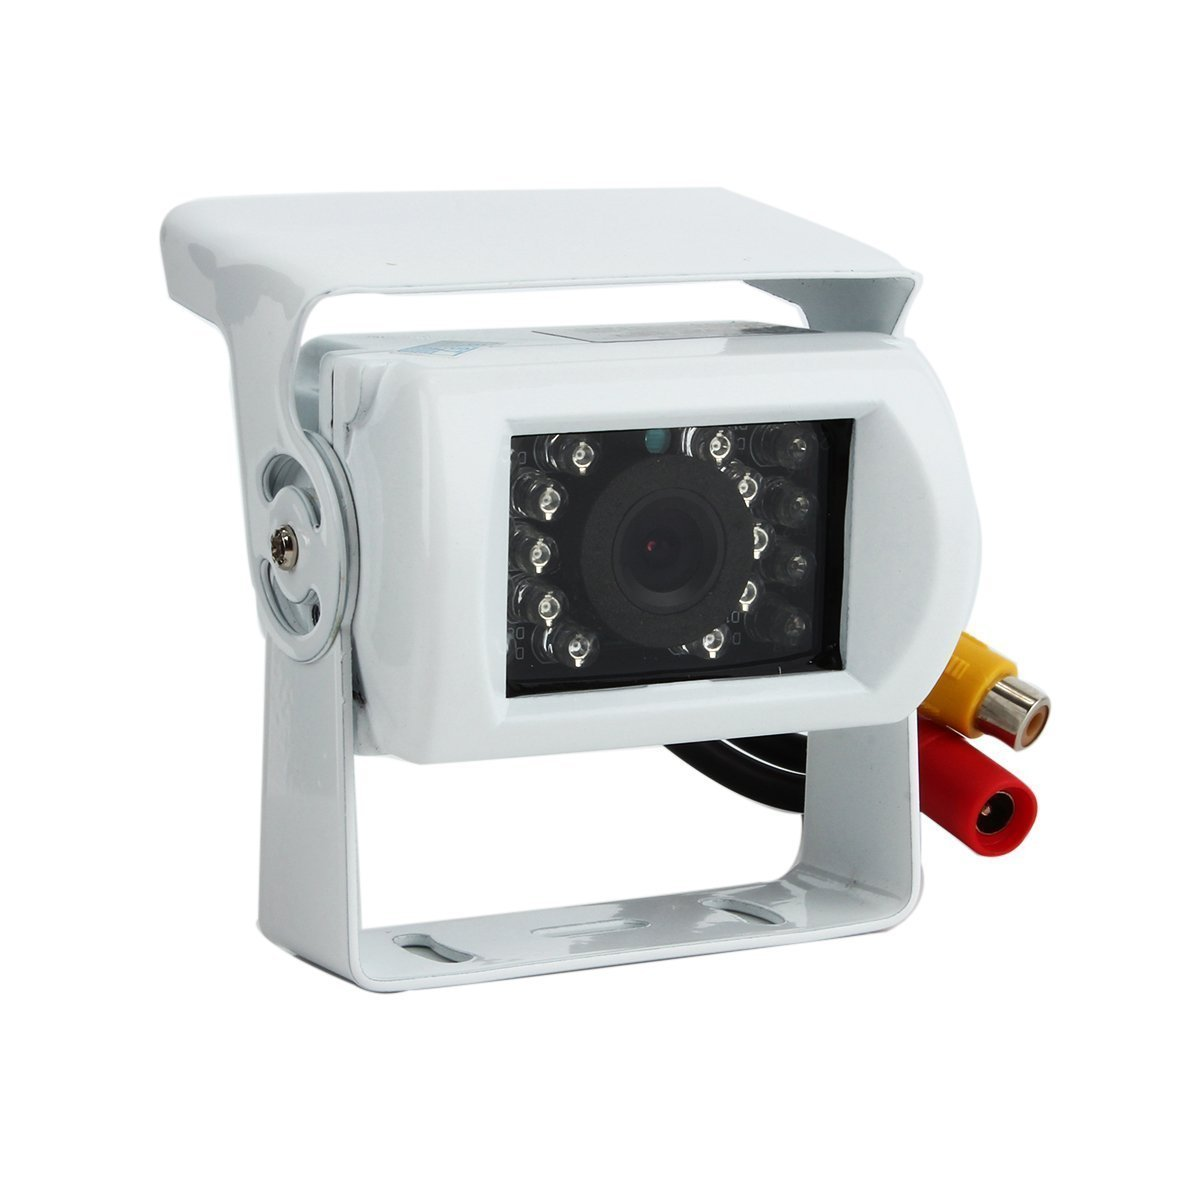 ATian Waterproof 18 LED Car Rear View Night Vision Reverse Video Backup Parking Camera Black Color